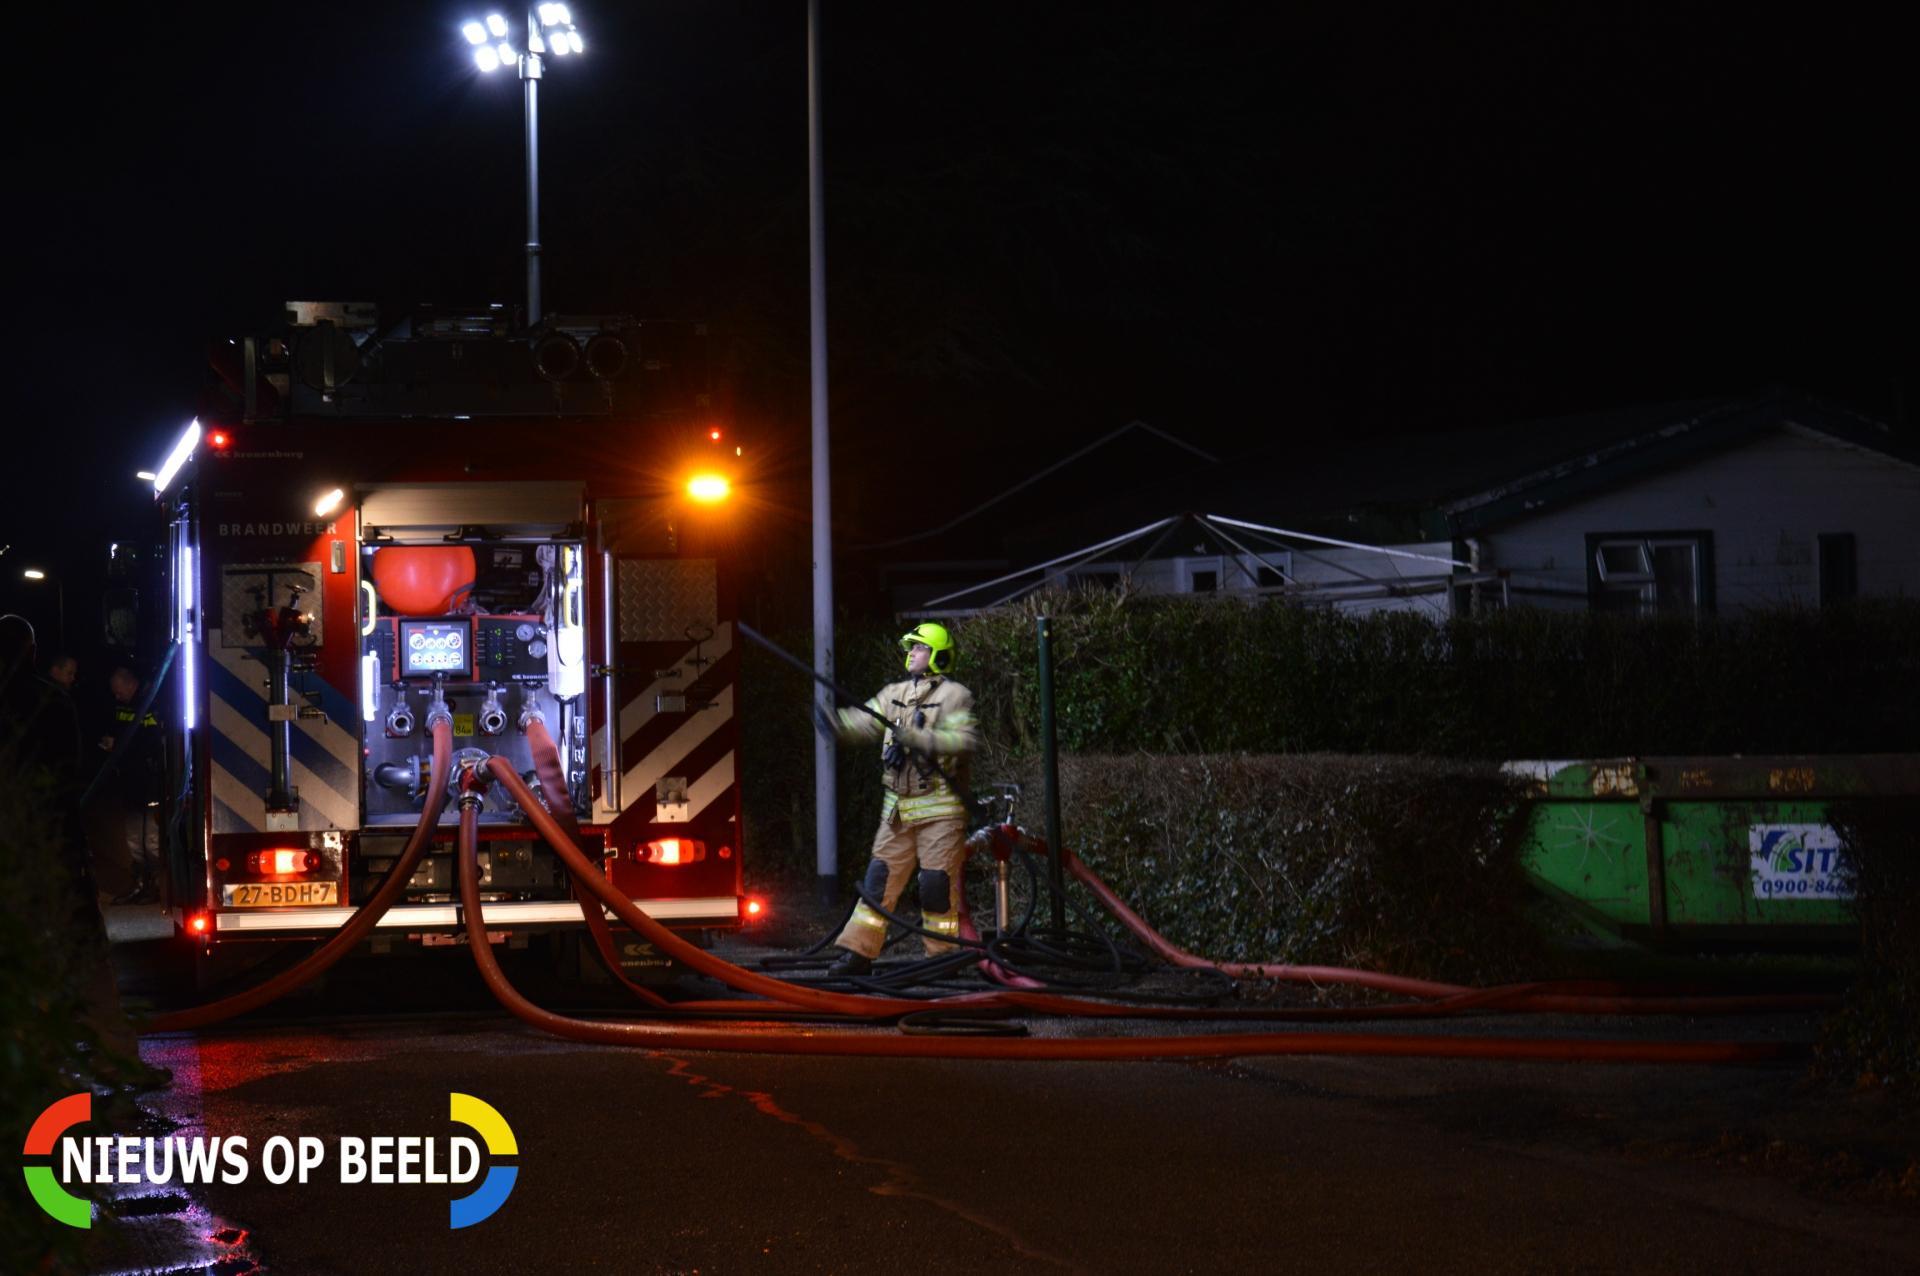 Wederom vakantiehuisje afgebrand camping Kruinigergors Gorsplein Oostvoorne